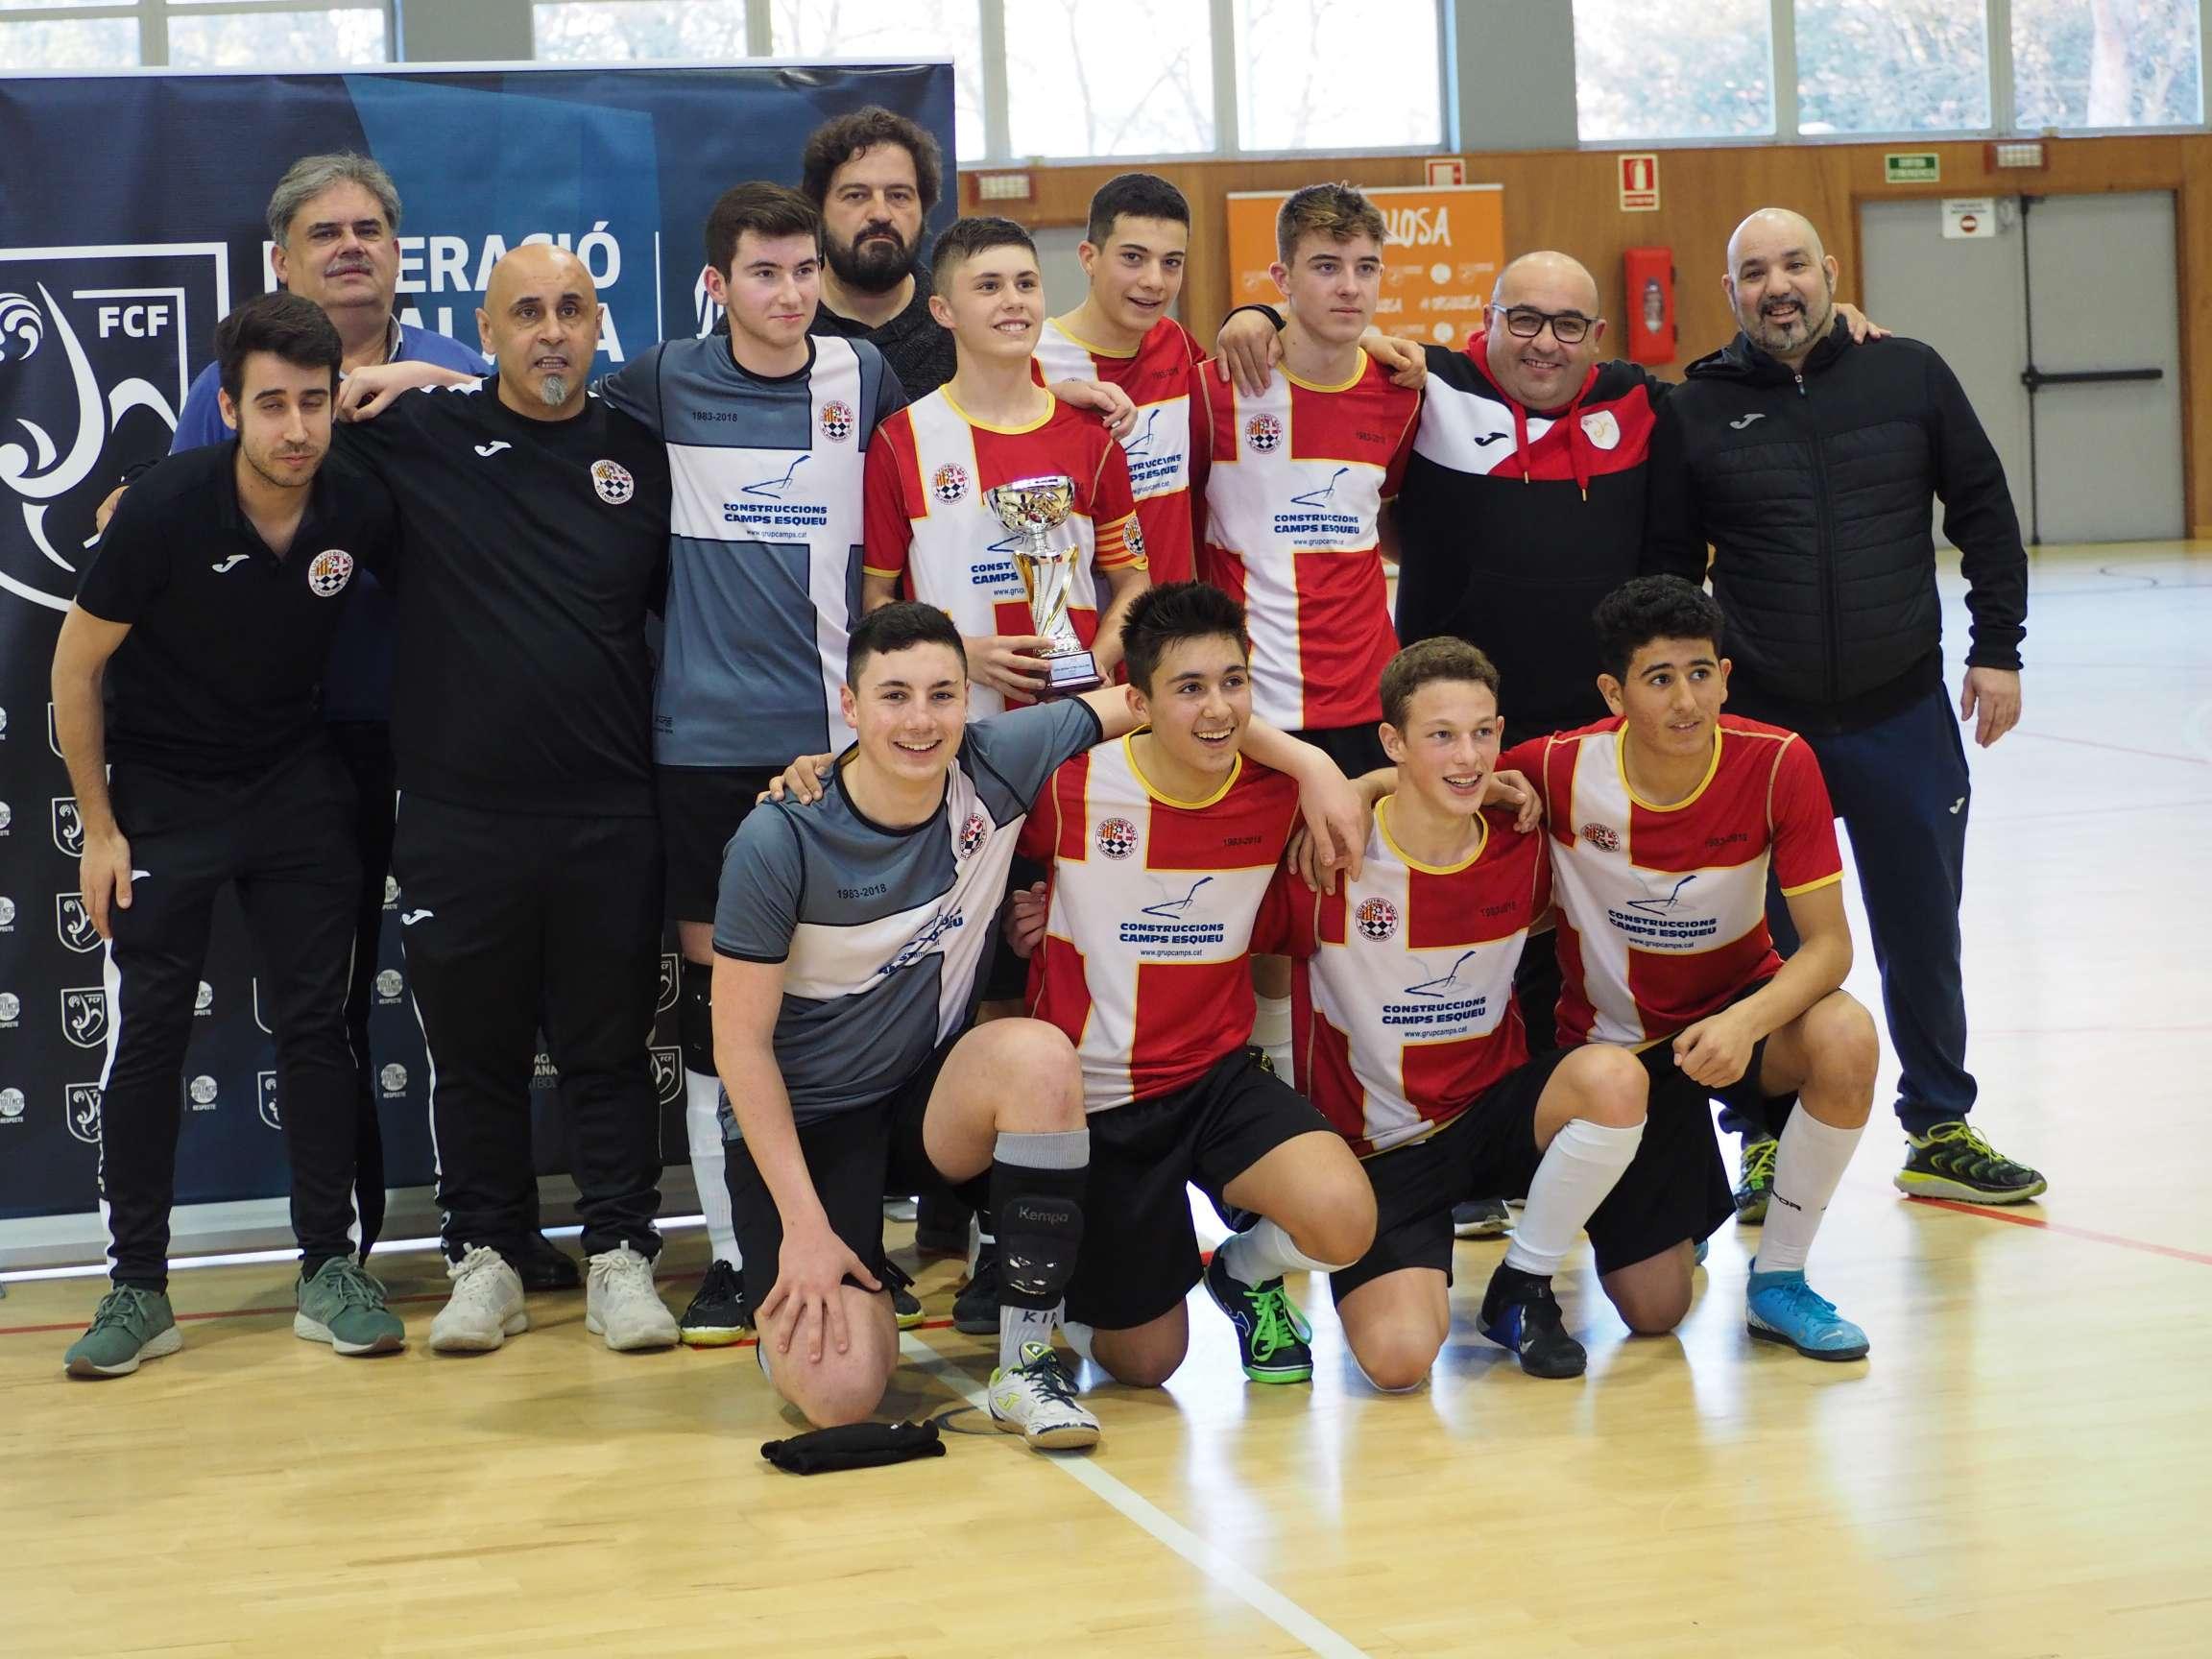 Campió Cadet Copa Girona - Blanesport 83 FS